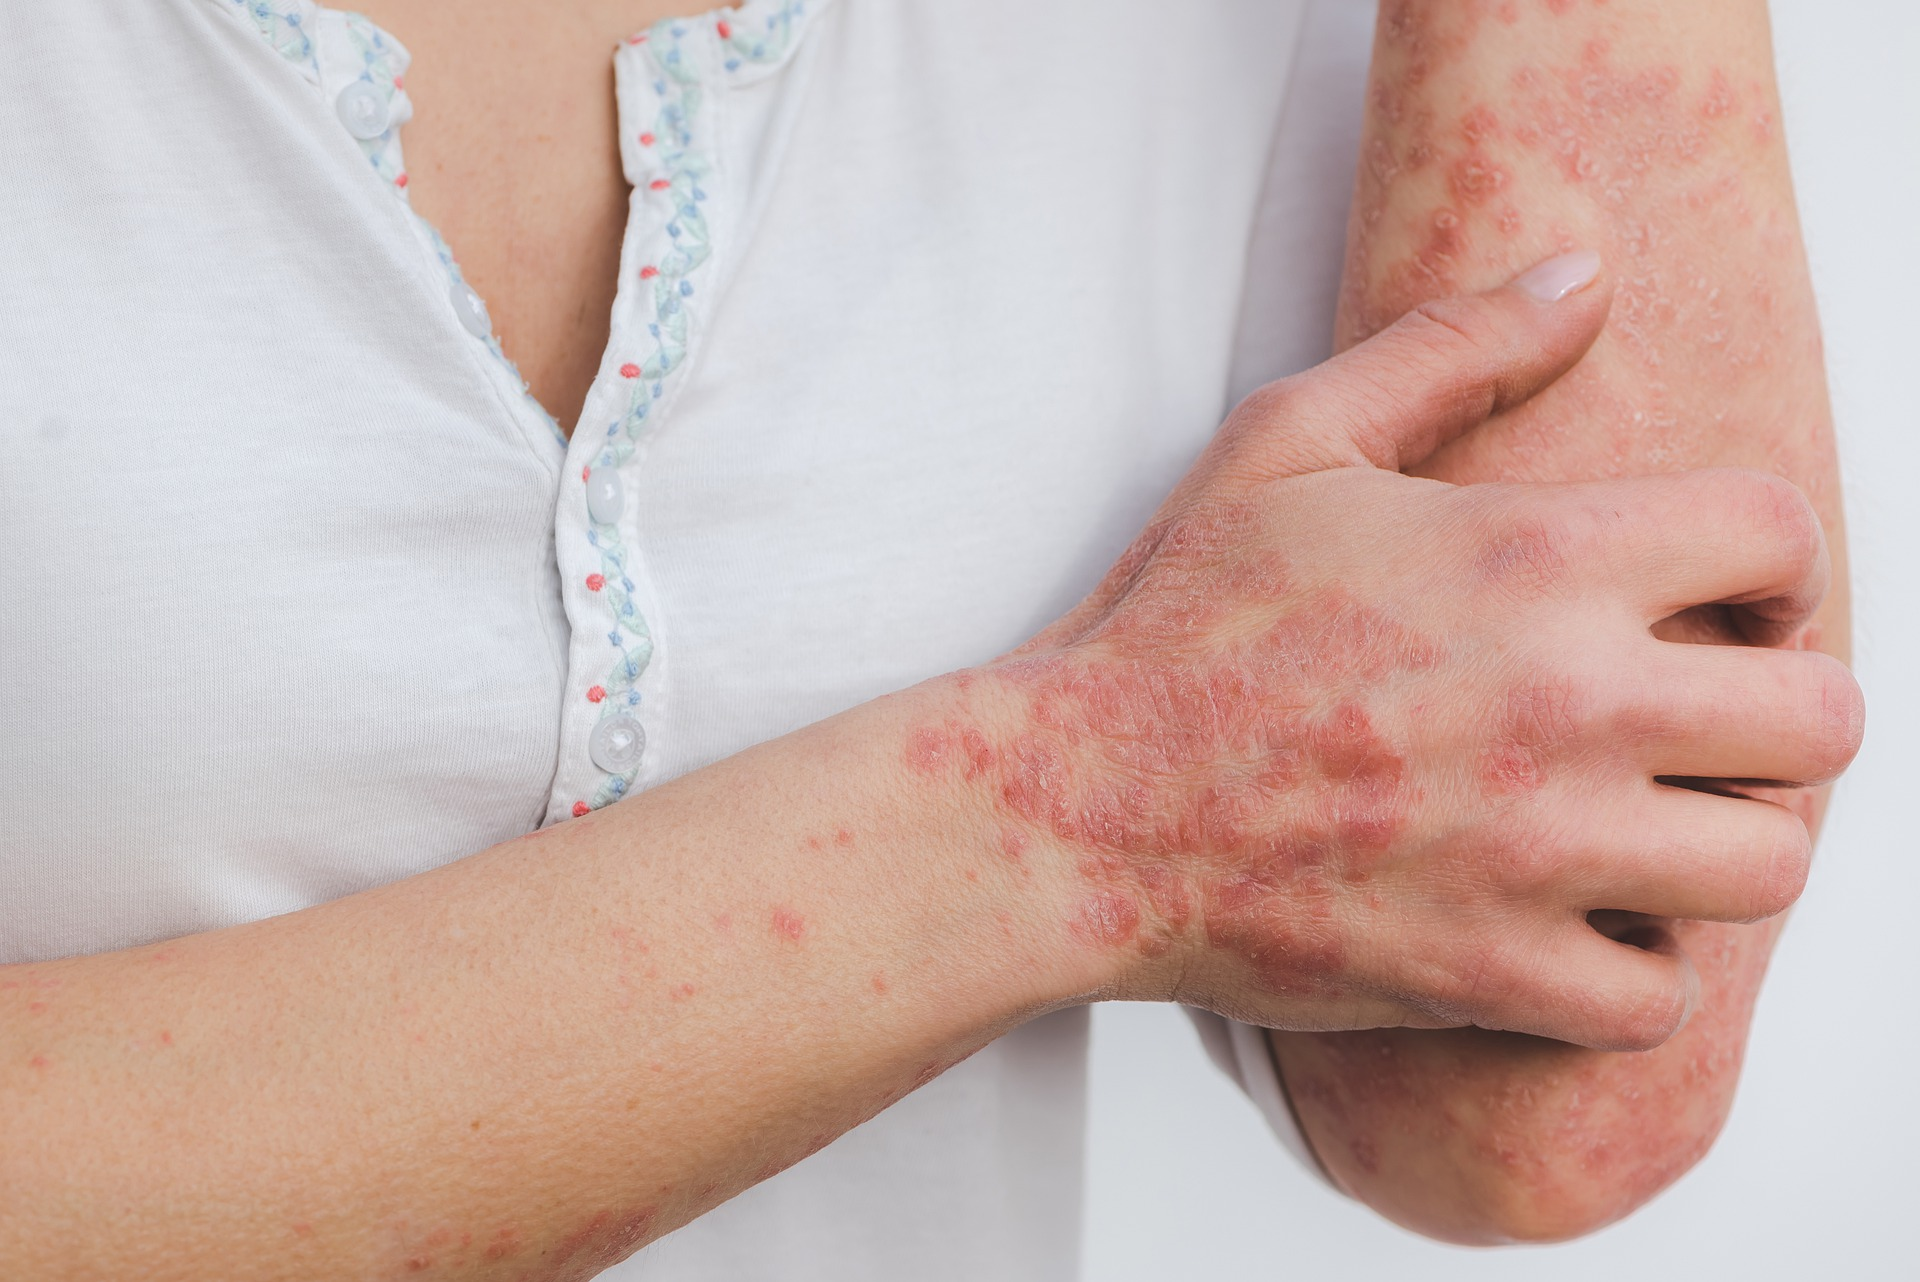 Treatment of psoriasis at Hera Medical Center